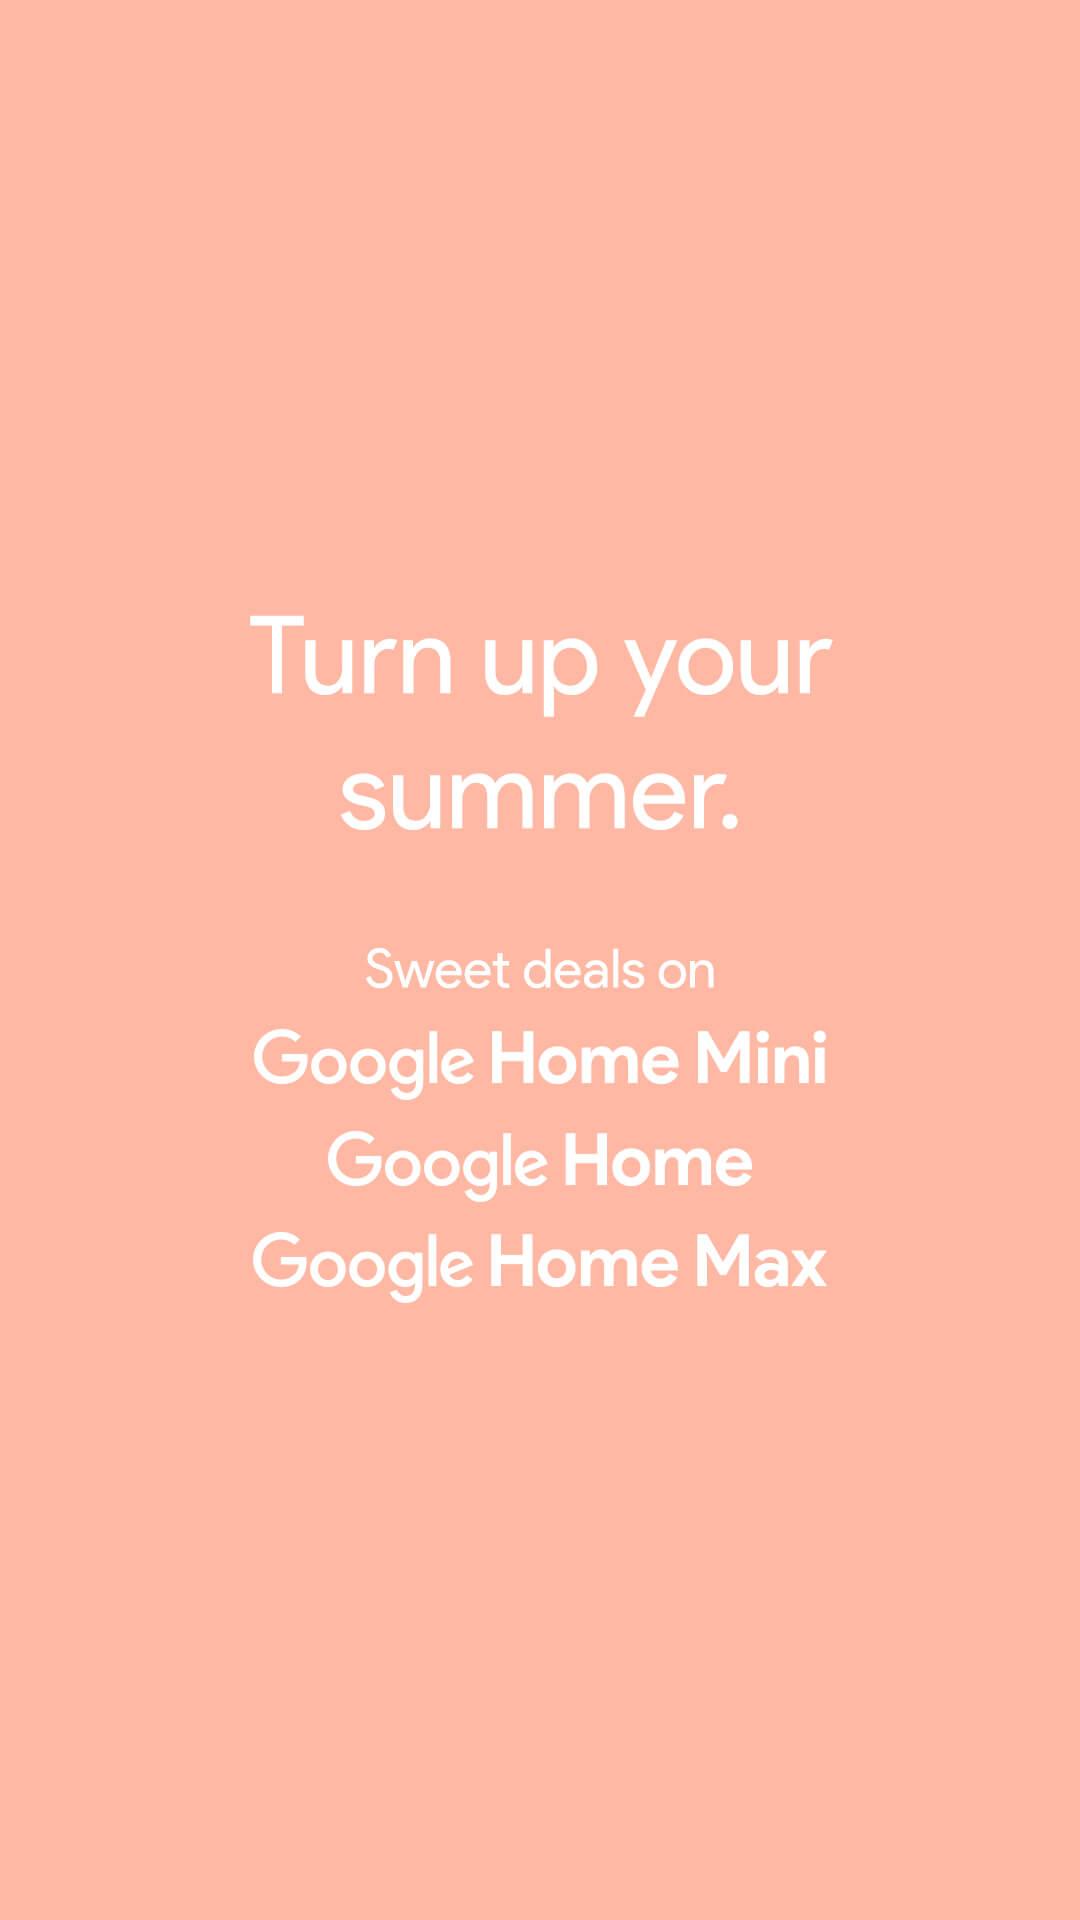 GoogleStore_Story_GoogleSans-01